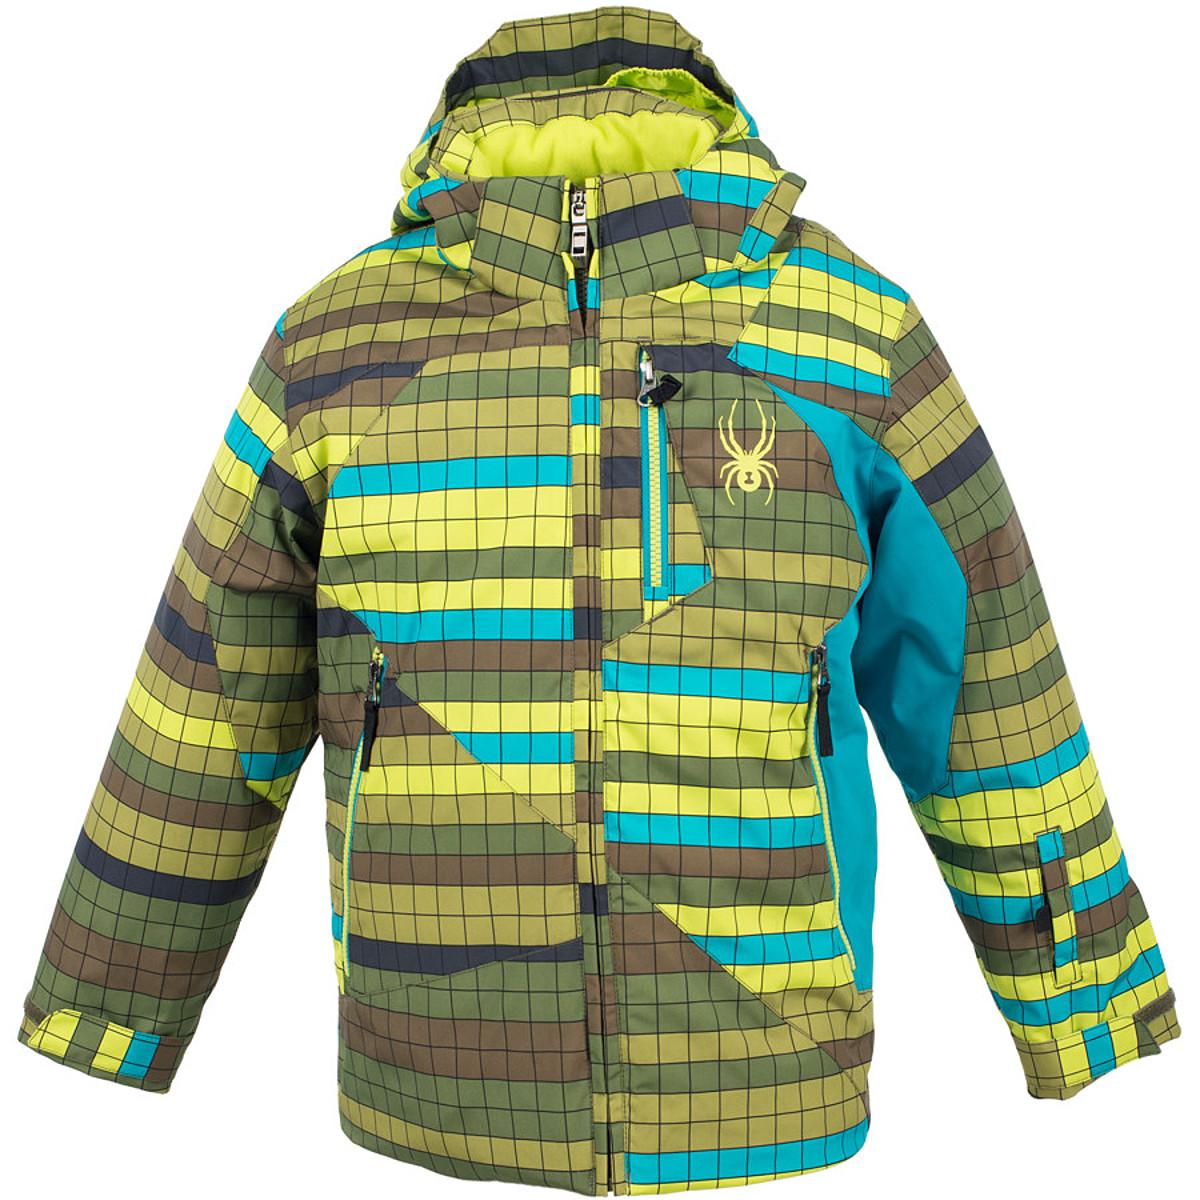 Spyder Armageddon Jacket